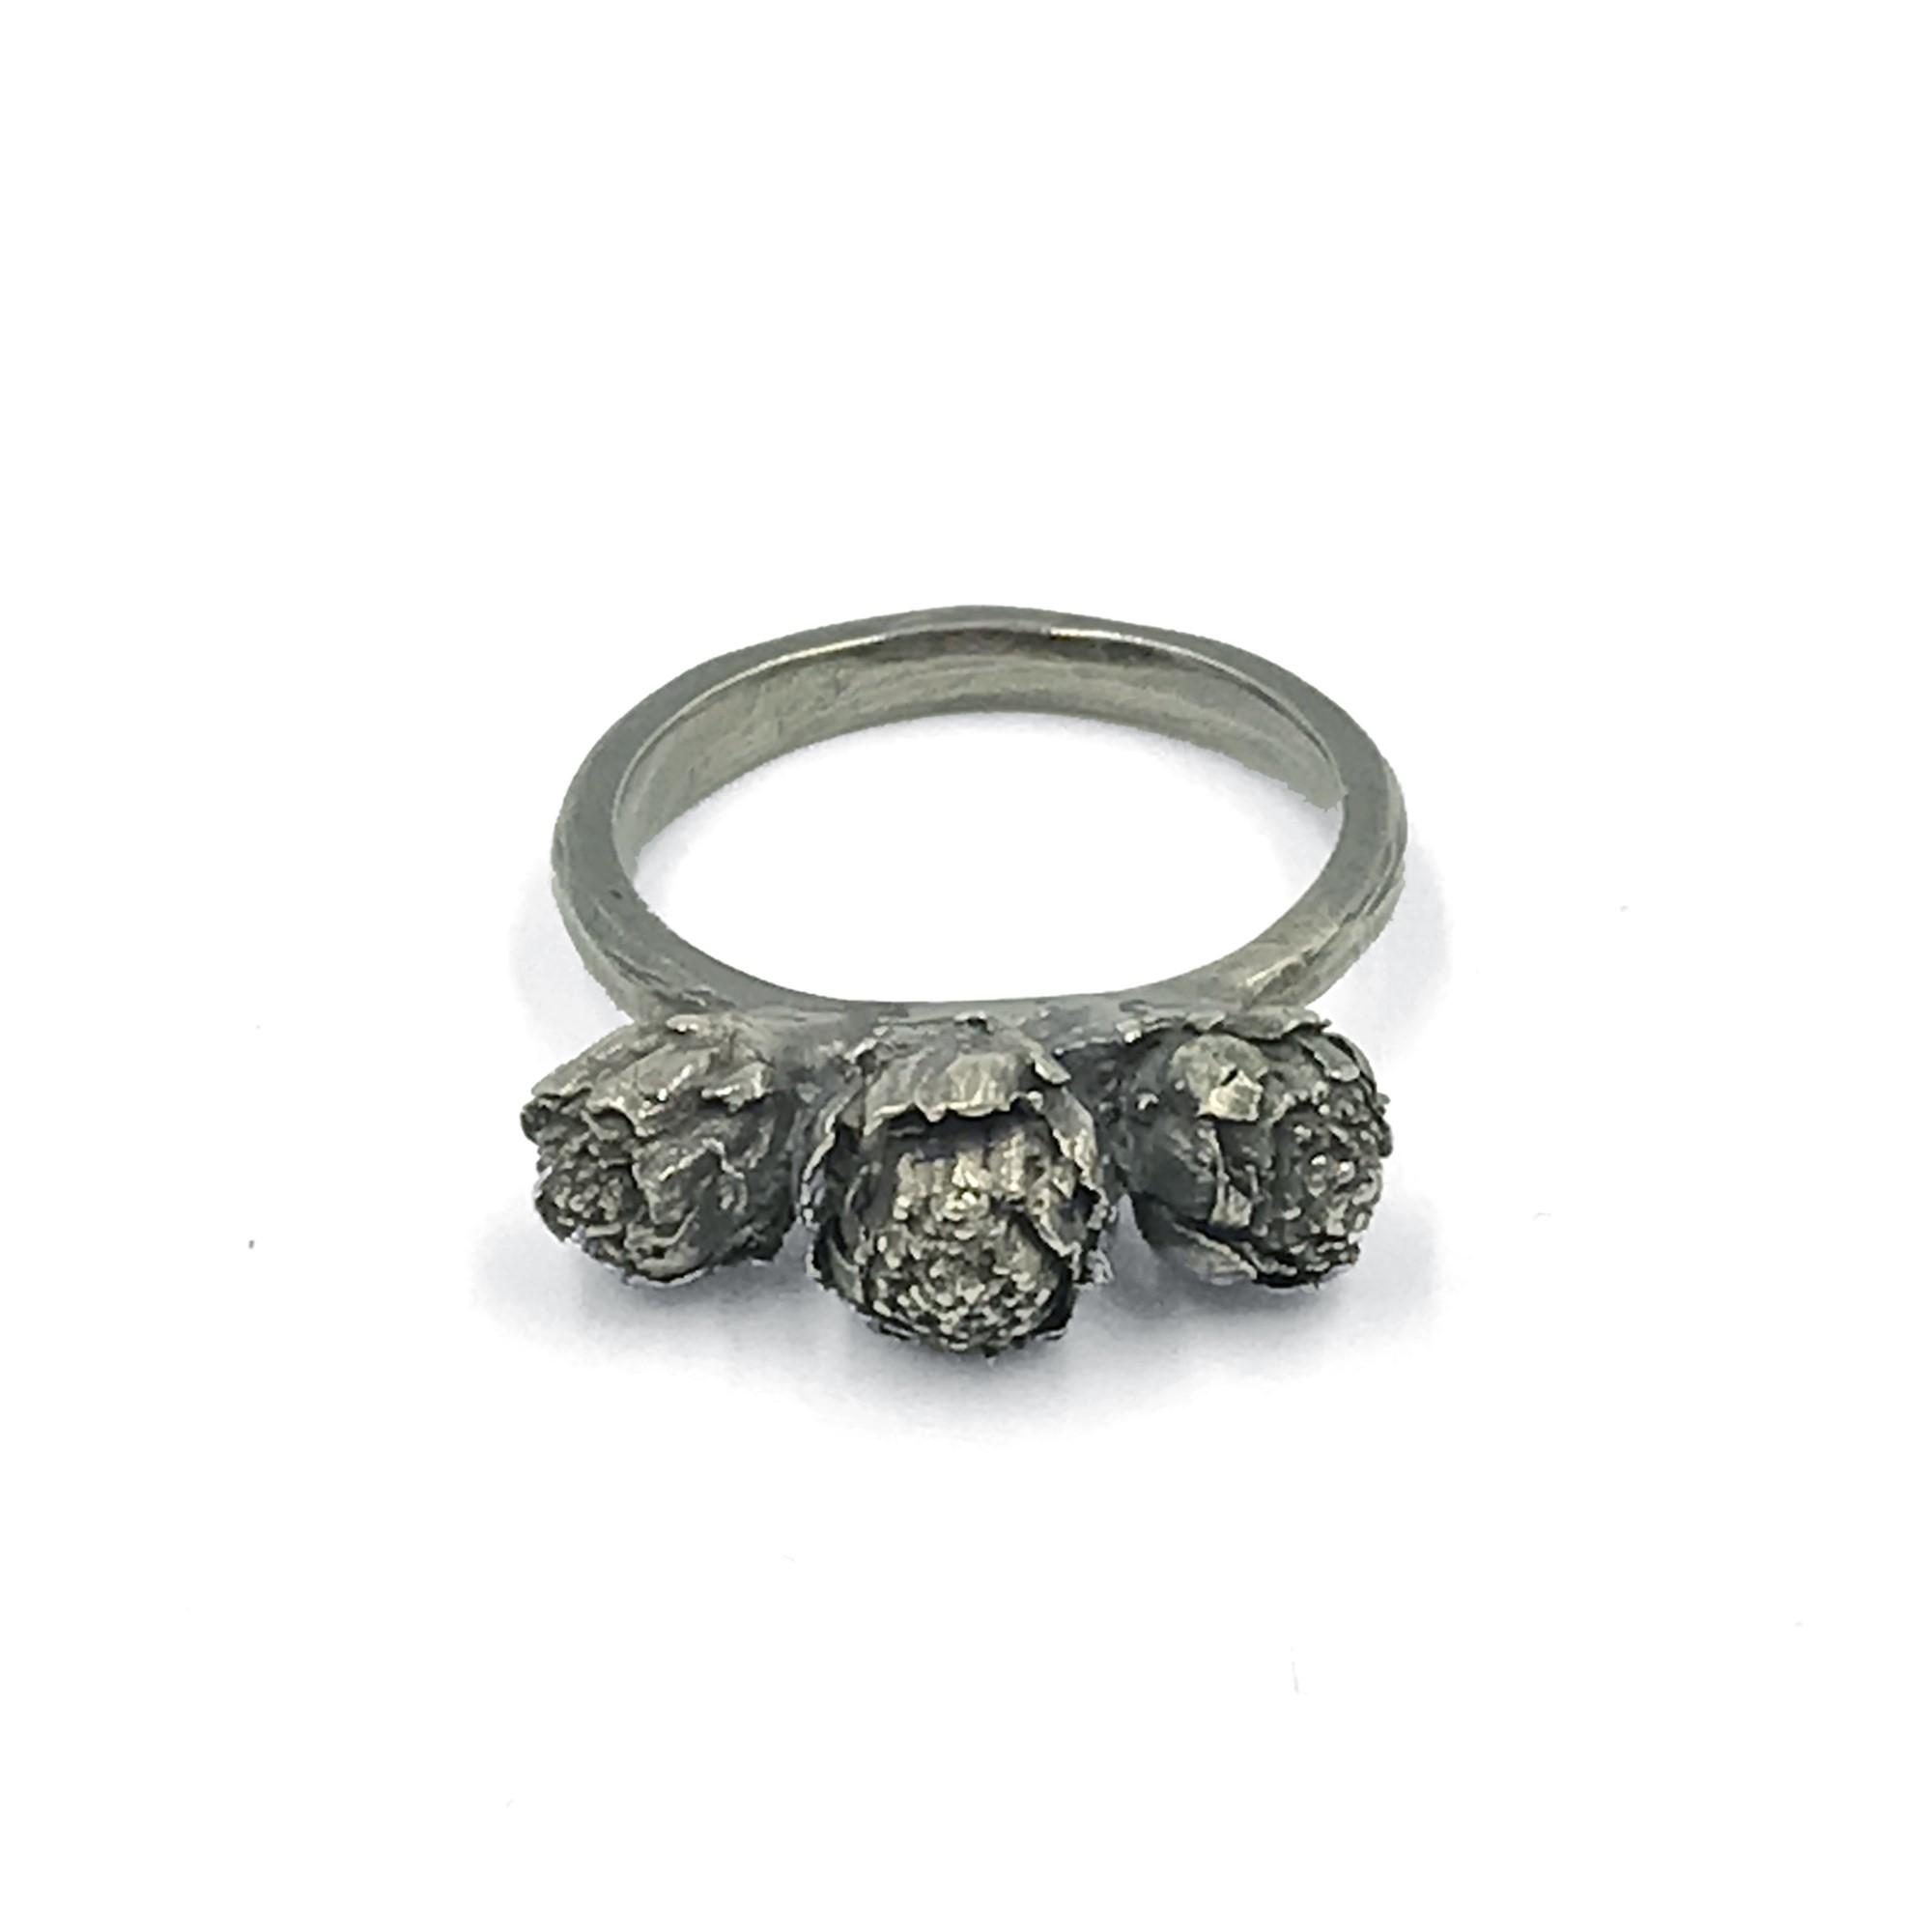 Bud Ring by Anna Johnson